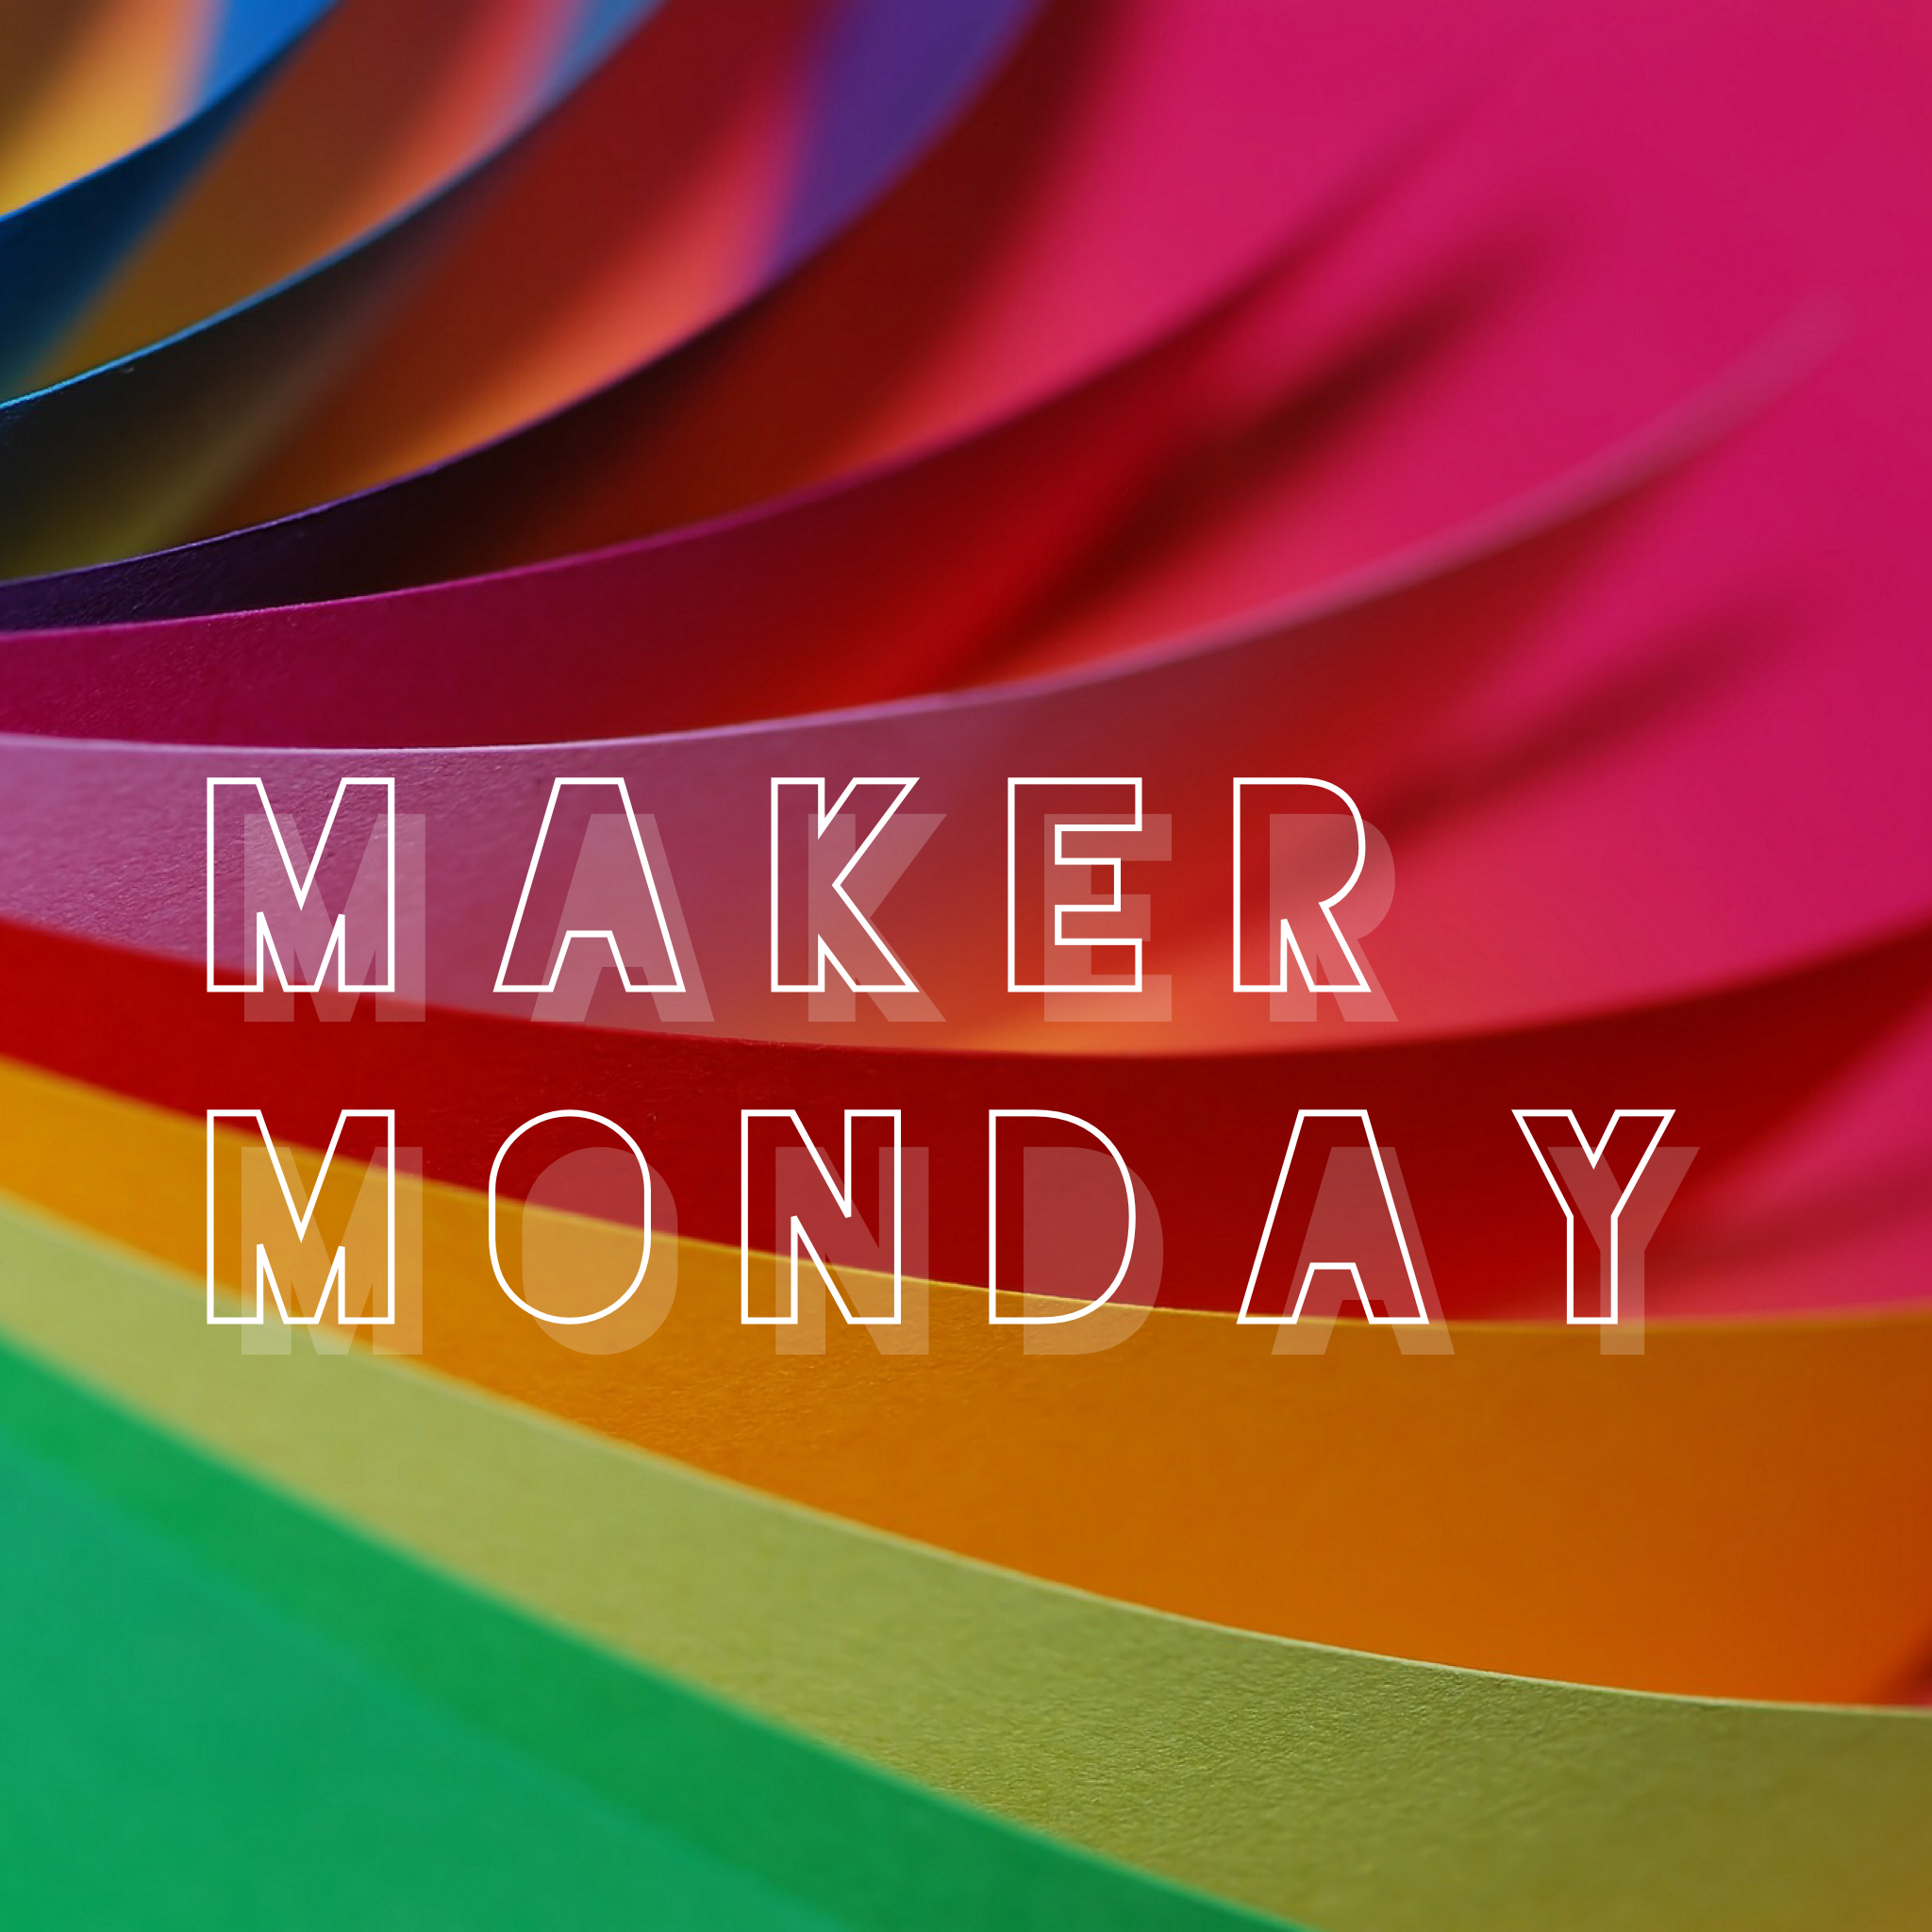 Maker monday.PNG